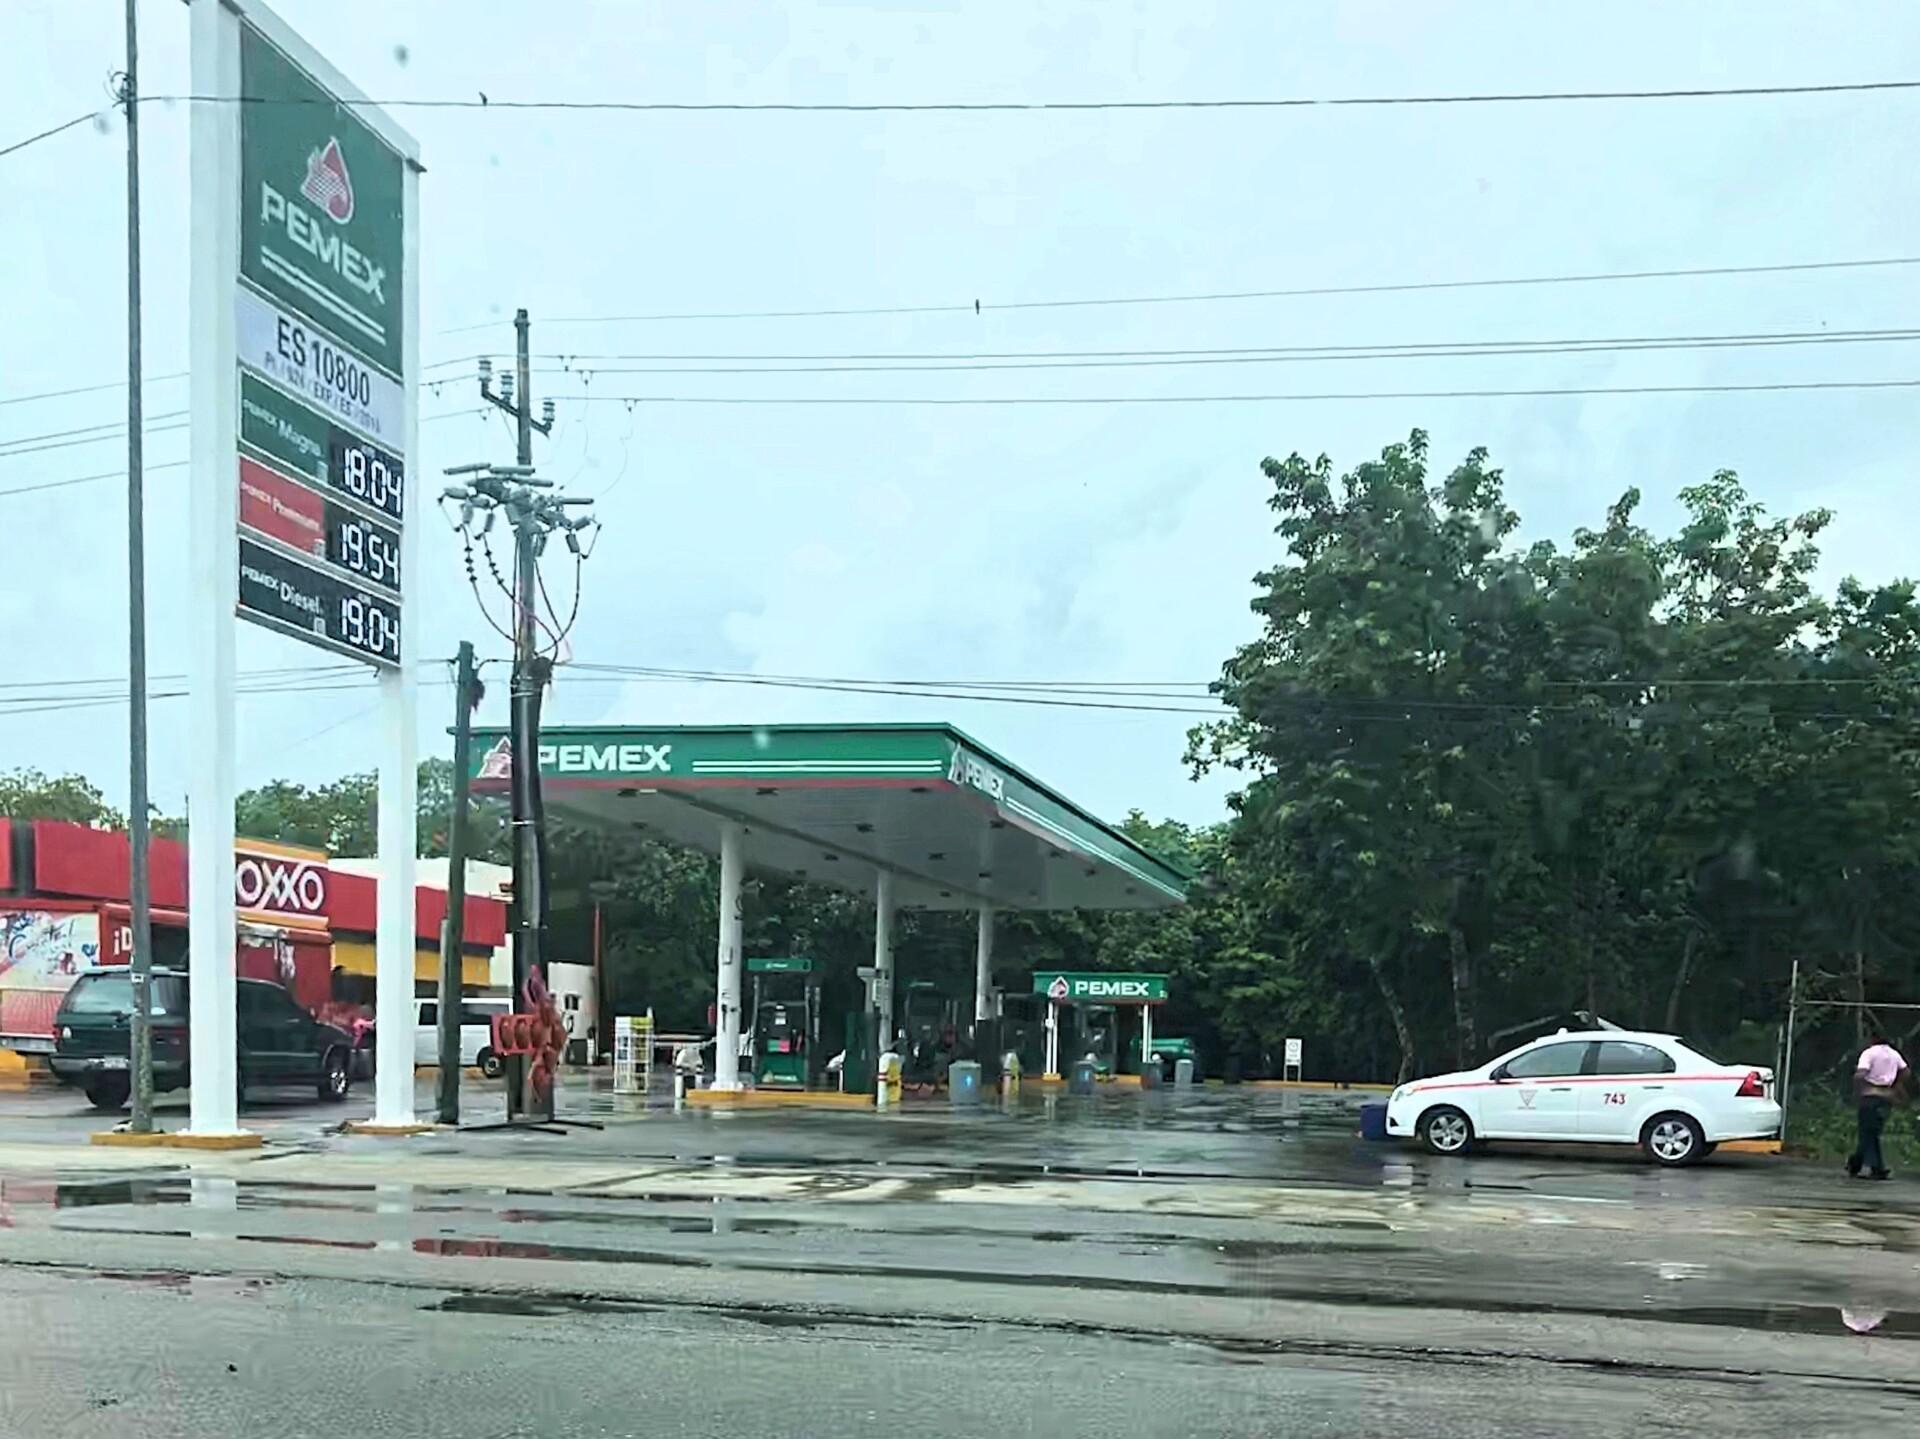 Fuppet på Pemex tankstation i Tulum – Turist scam i Mexico